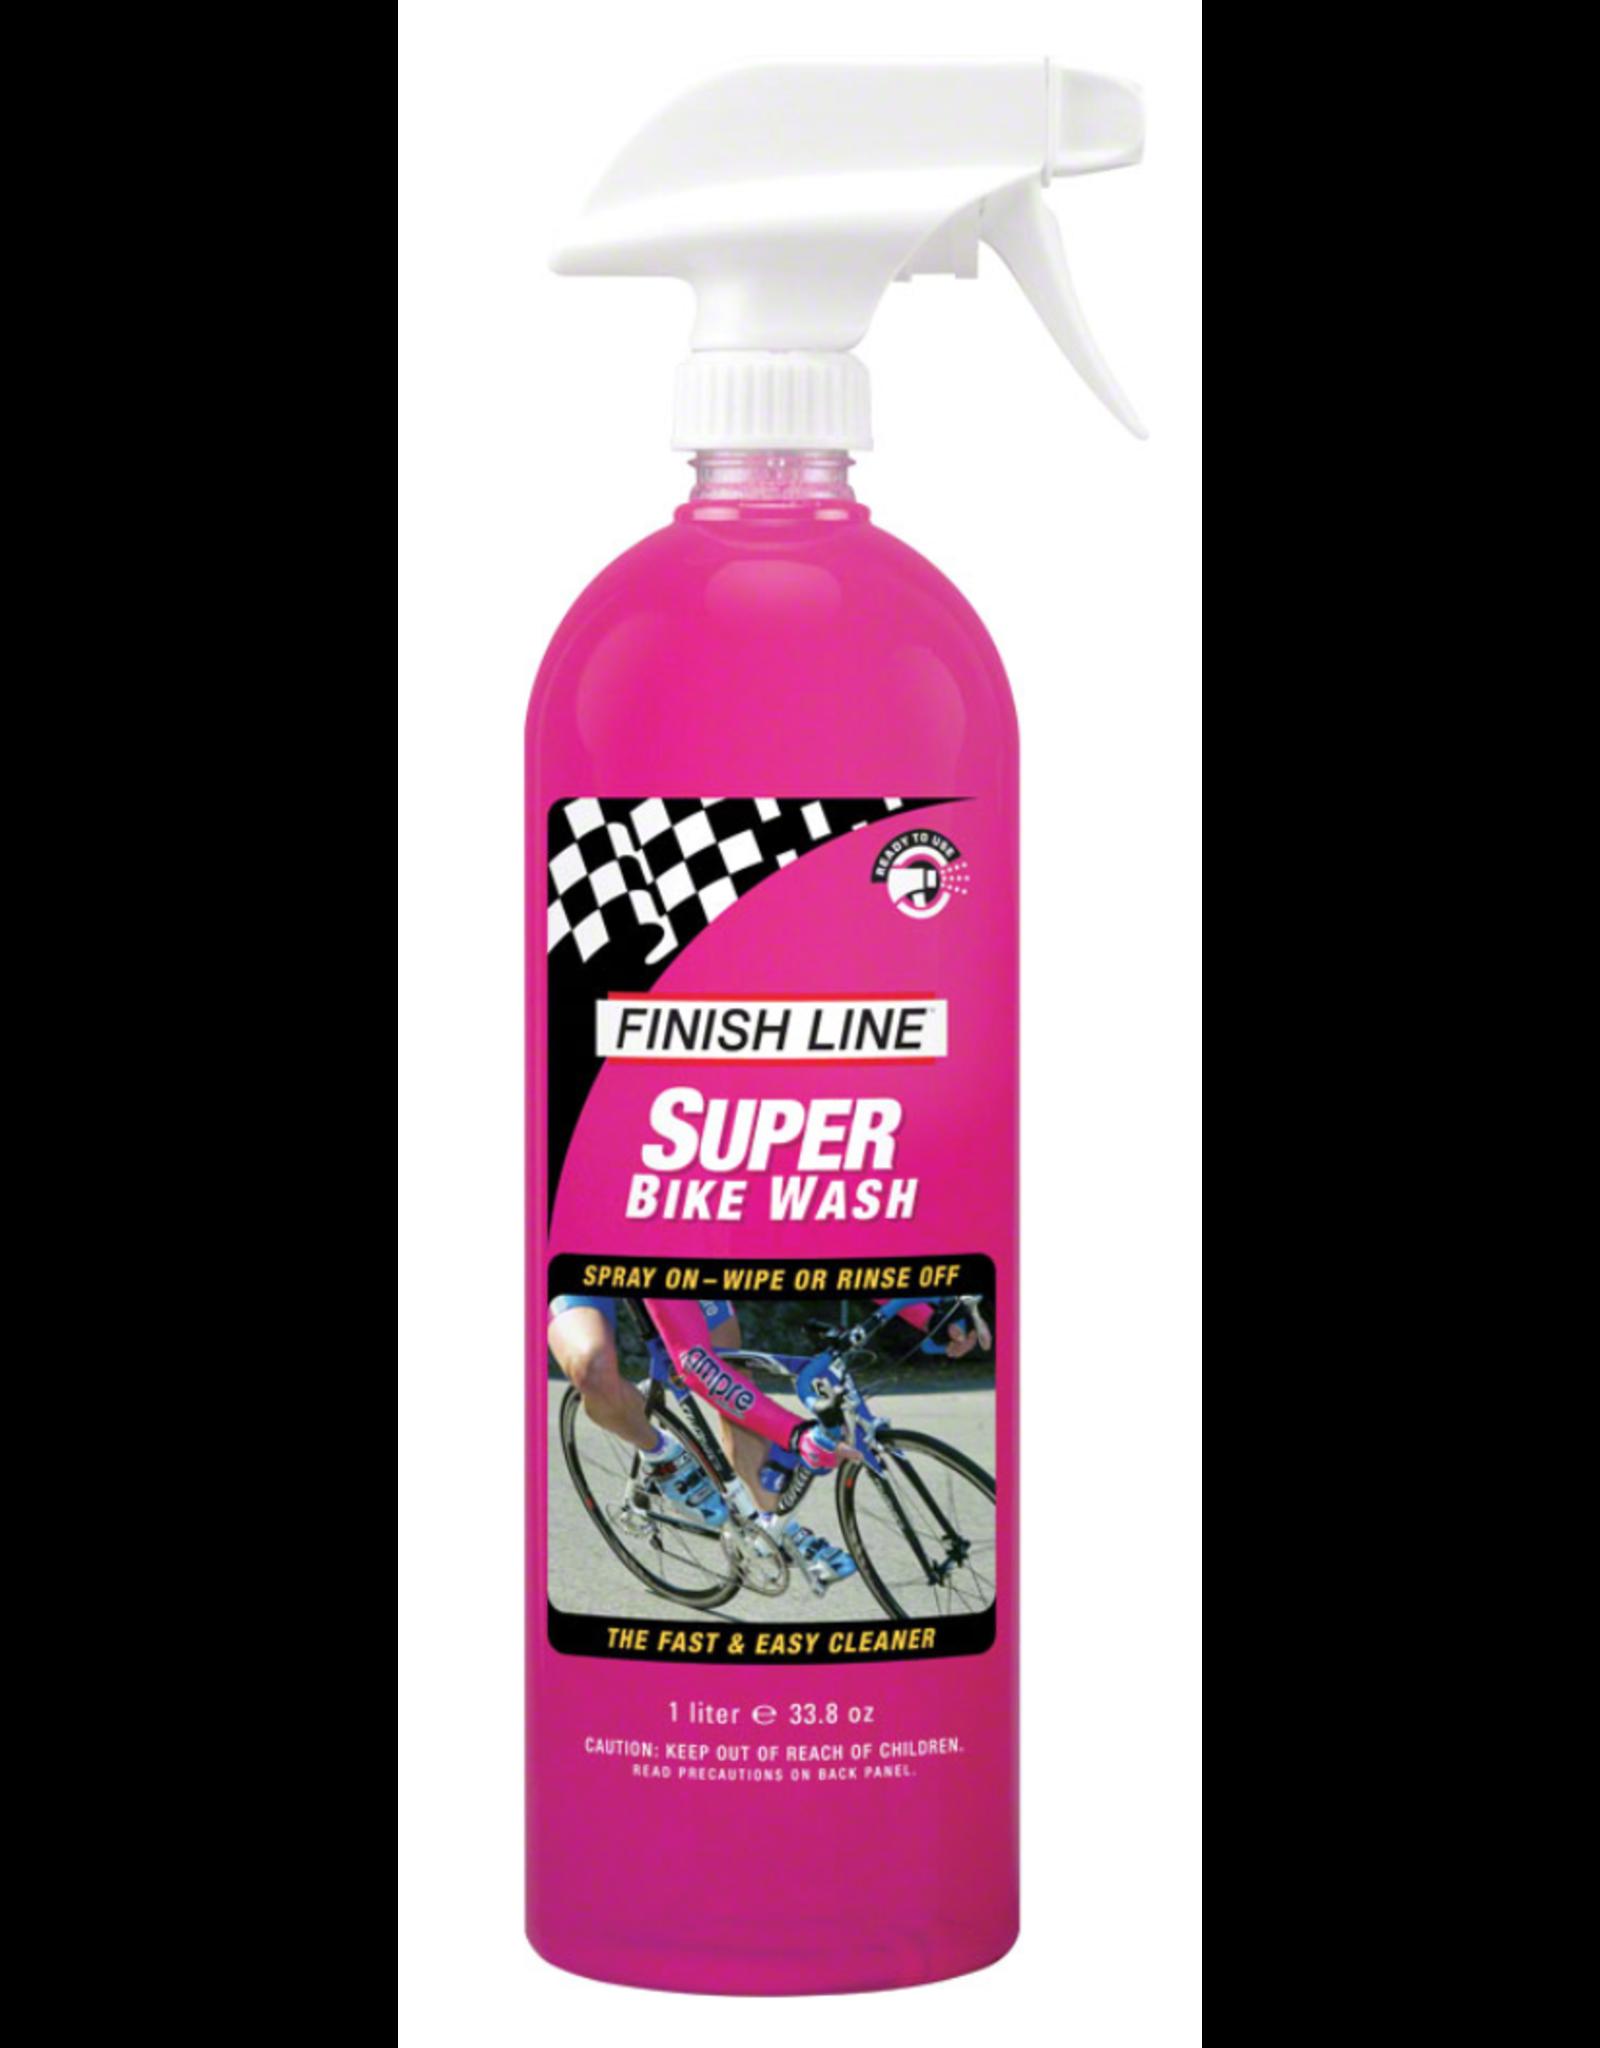 Finish Line FINISH LINE Super Bike Wash: 34 oz Hand Spray Bottle